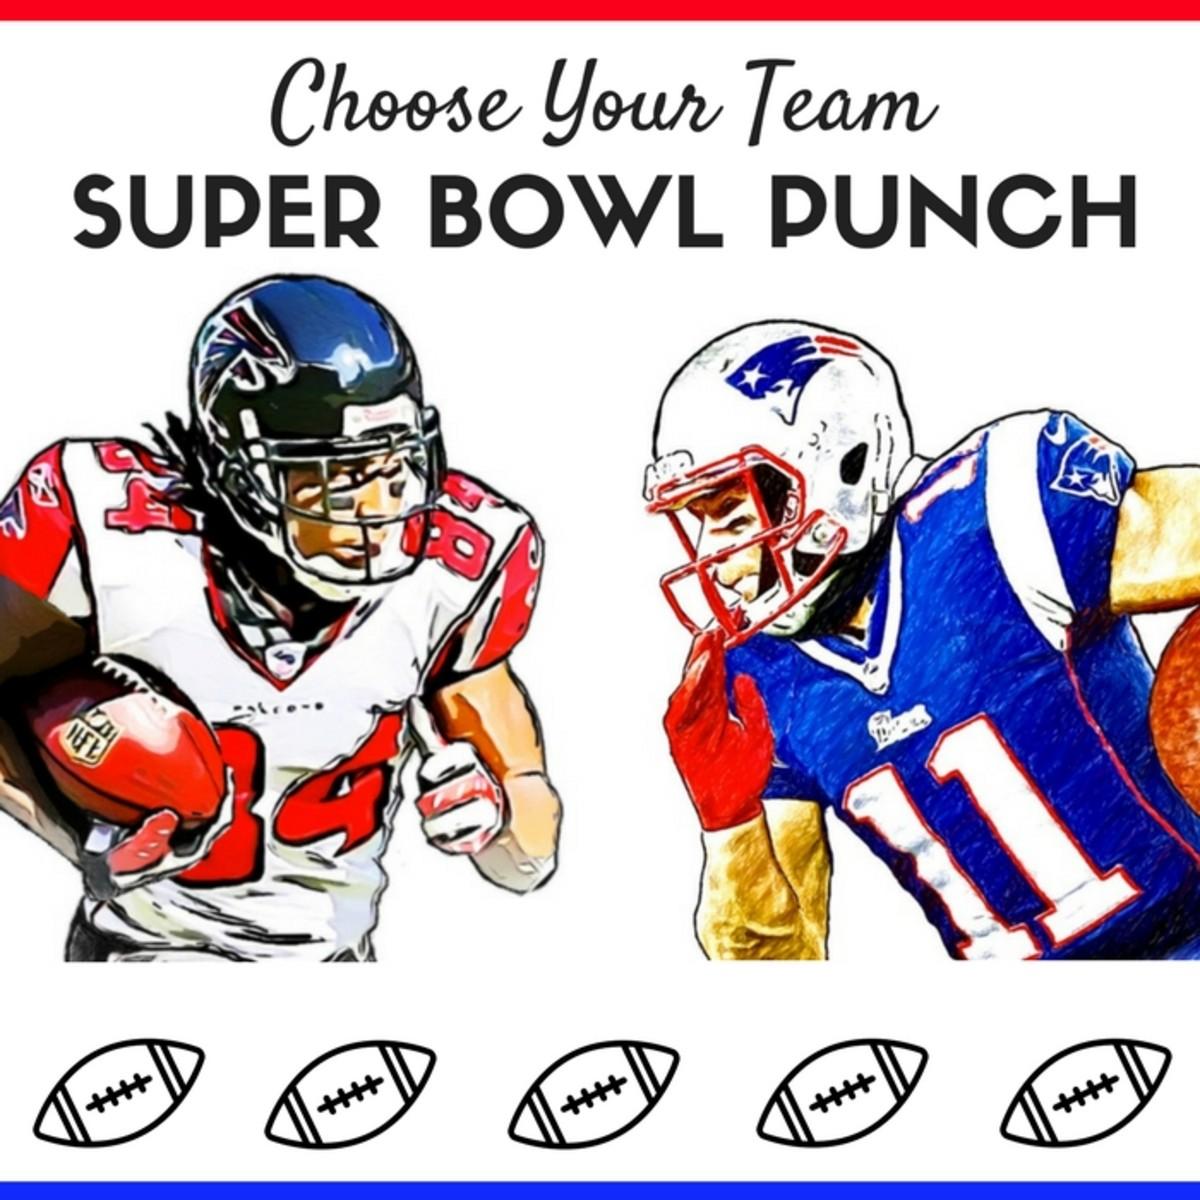 Super Bowl Punch